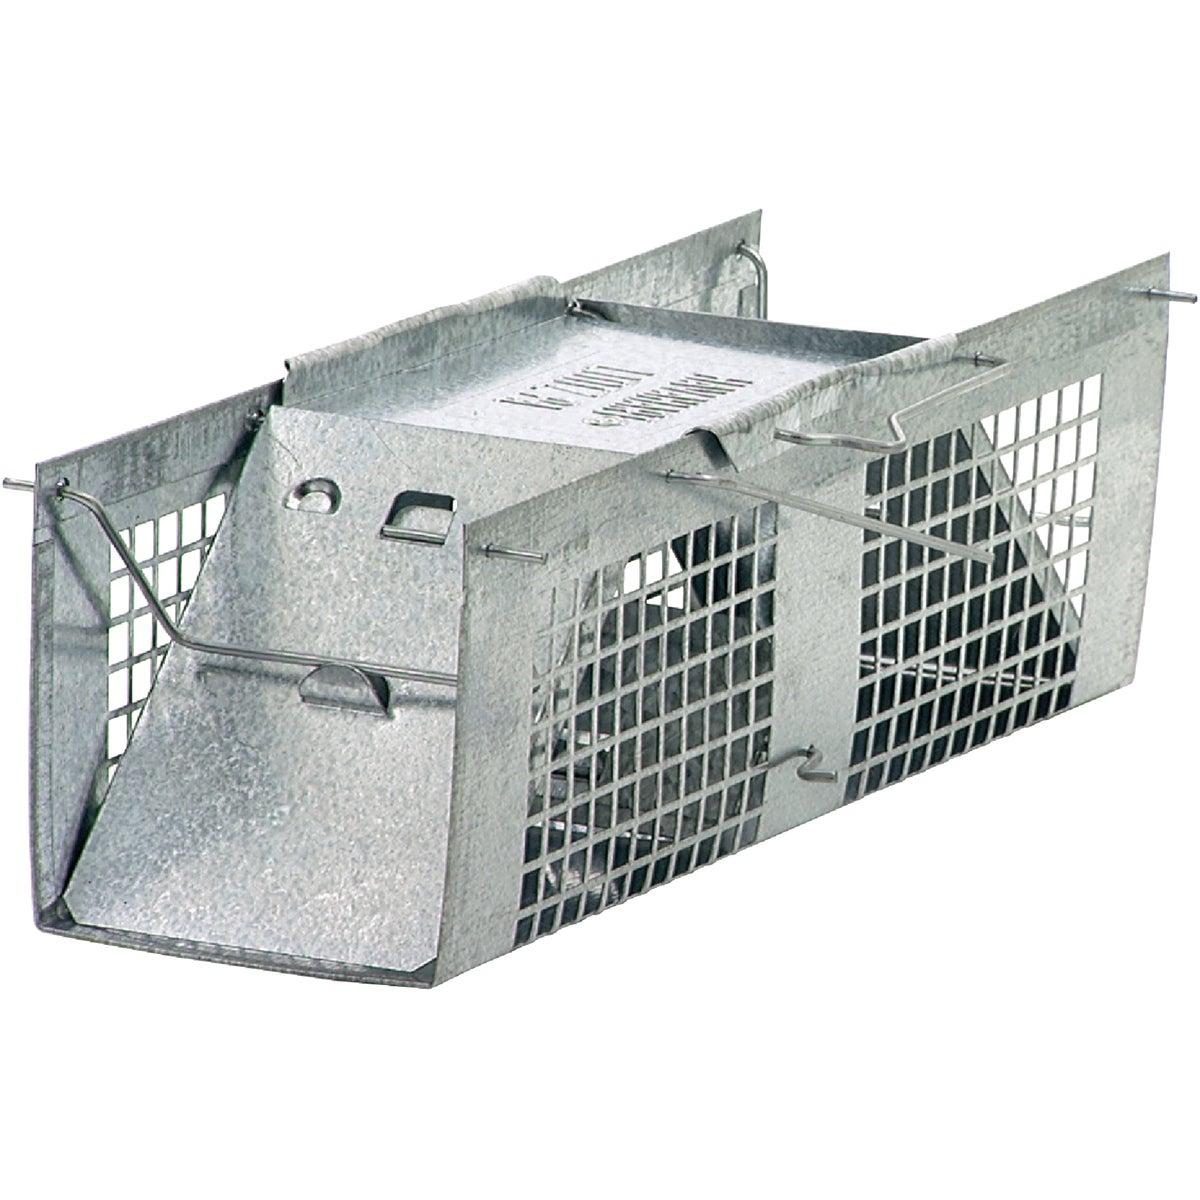 10X3X3 2-Door Mouse Trap